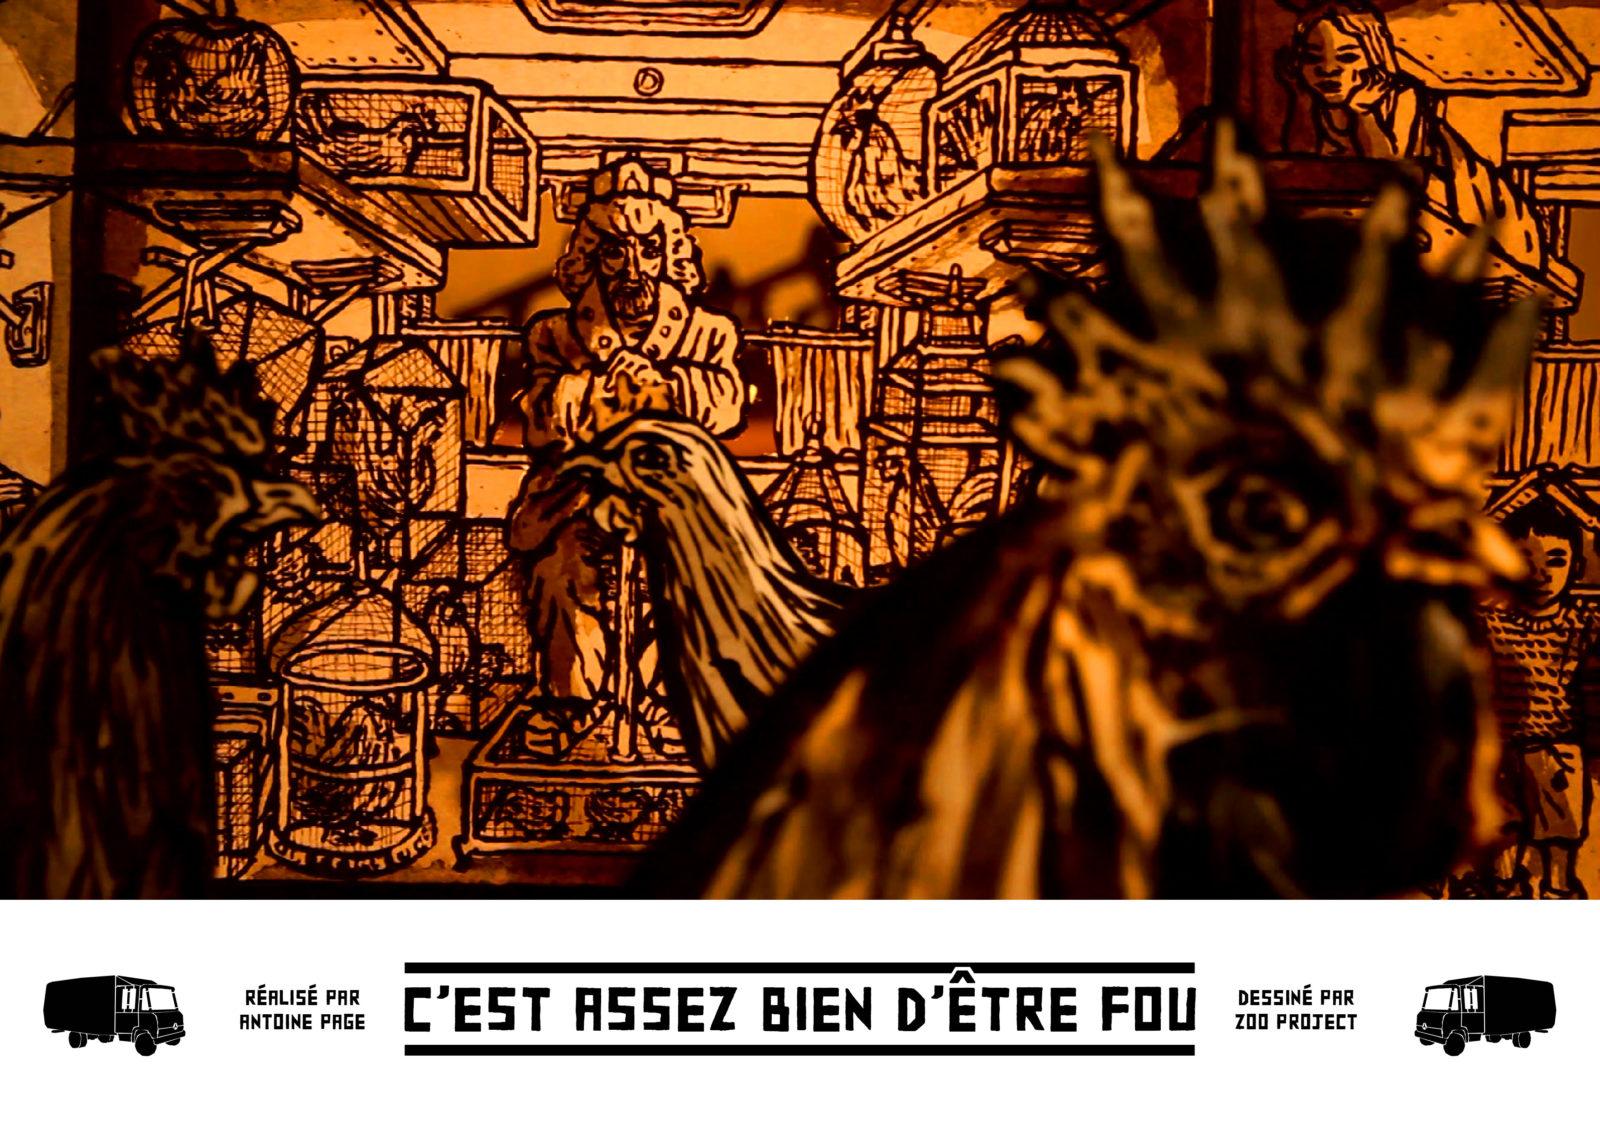 antoine page zoo project hommage documentaire - Le documentaire-hommage au street artiste Zoo Project enfin au cinéma